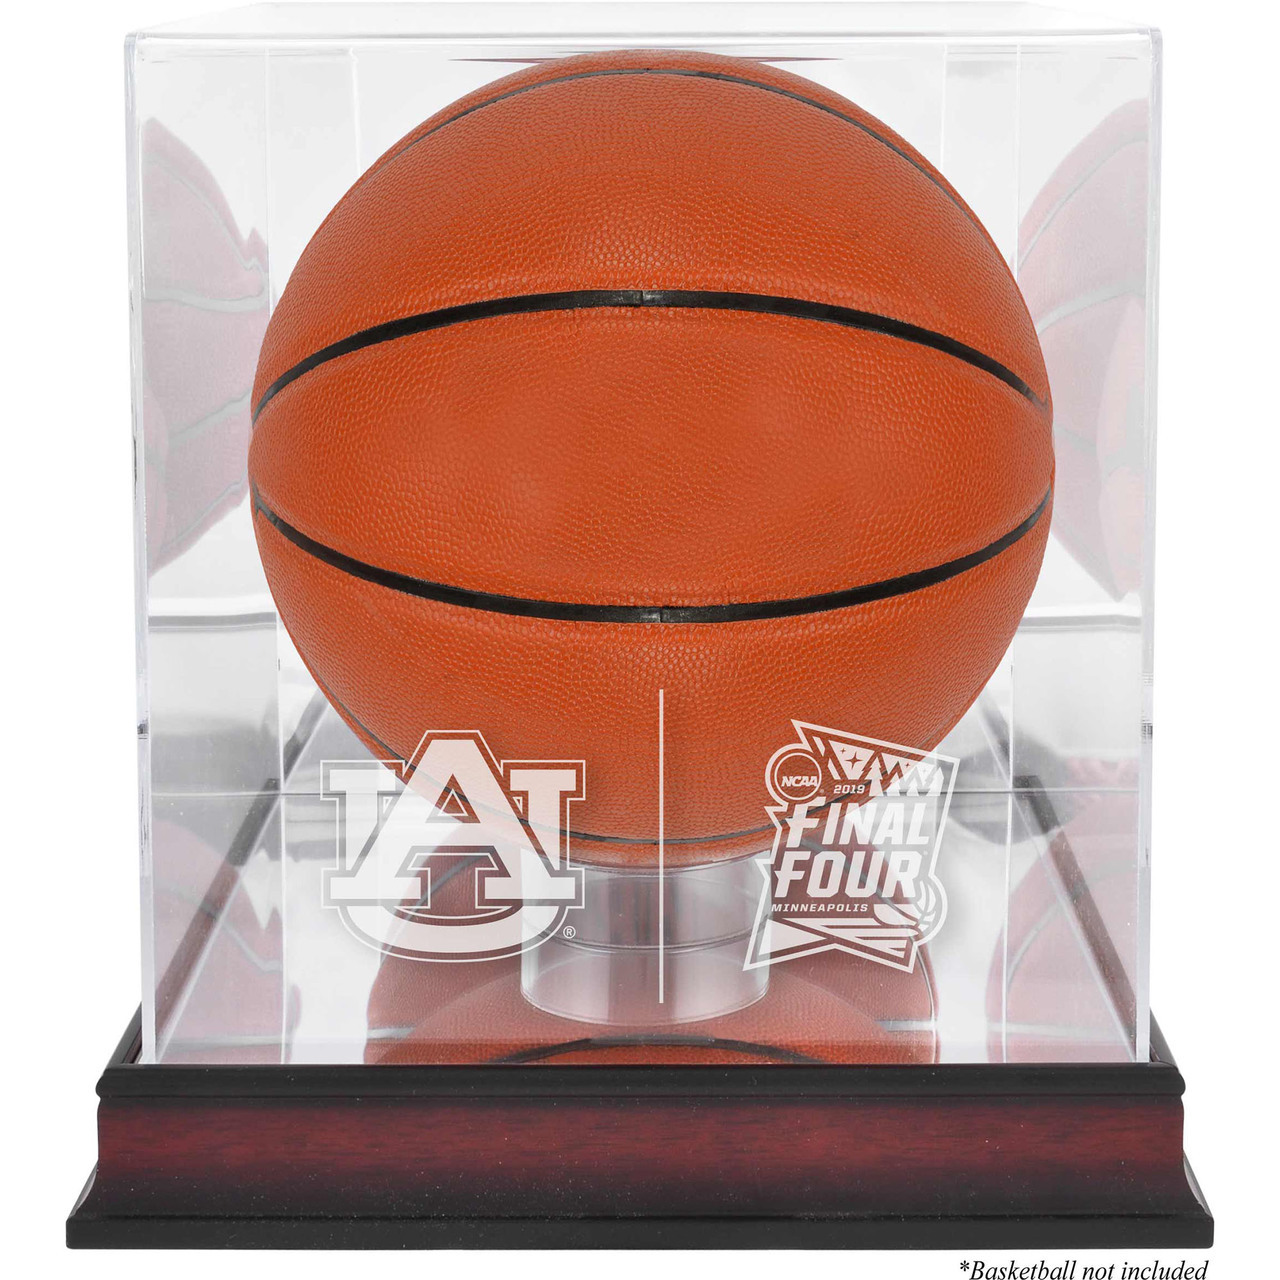 d7d4322d9 Auburn Tigers Logo Final Four Mahogany Basketball Display Case